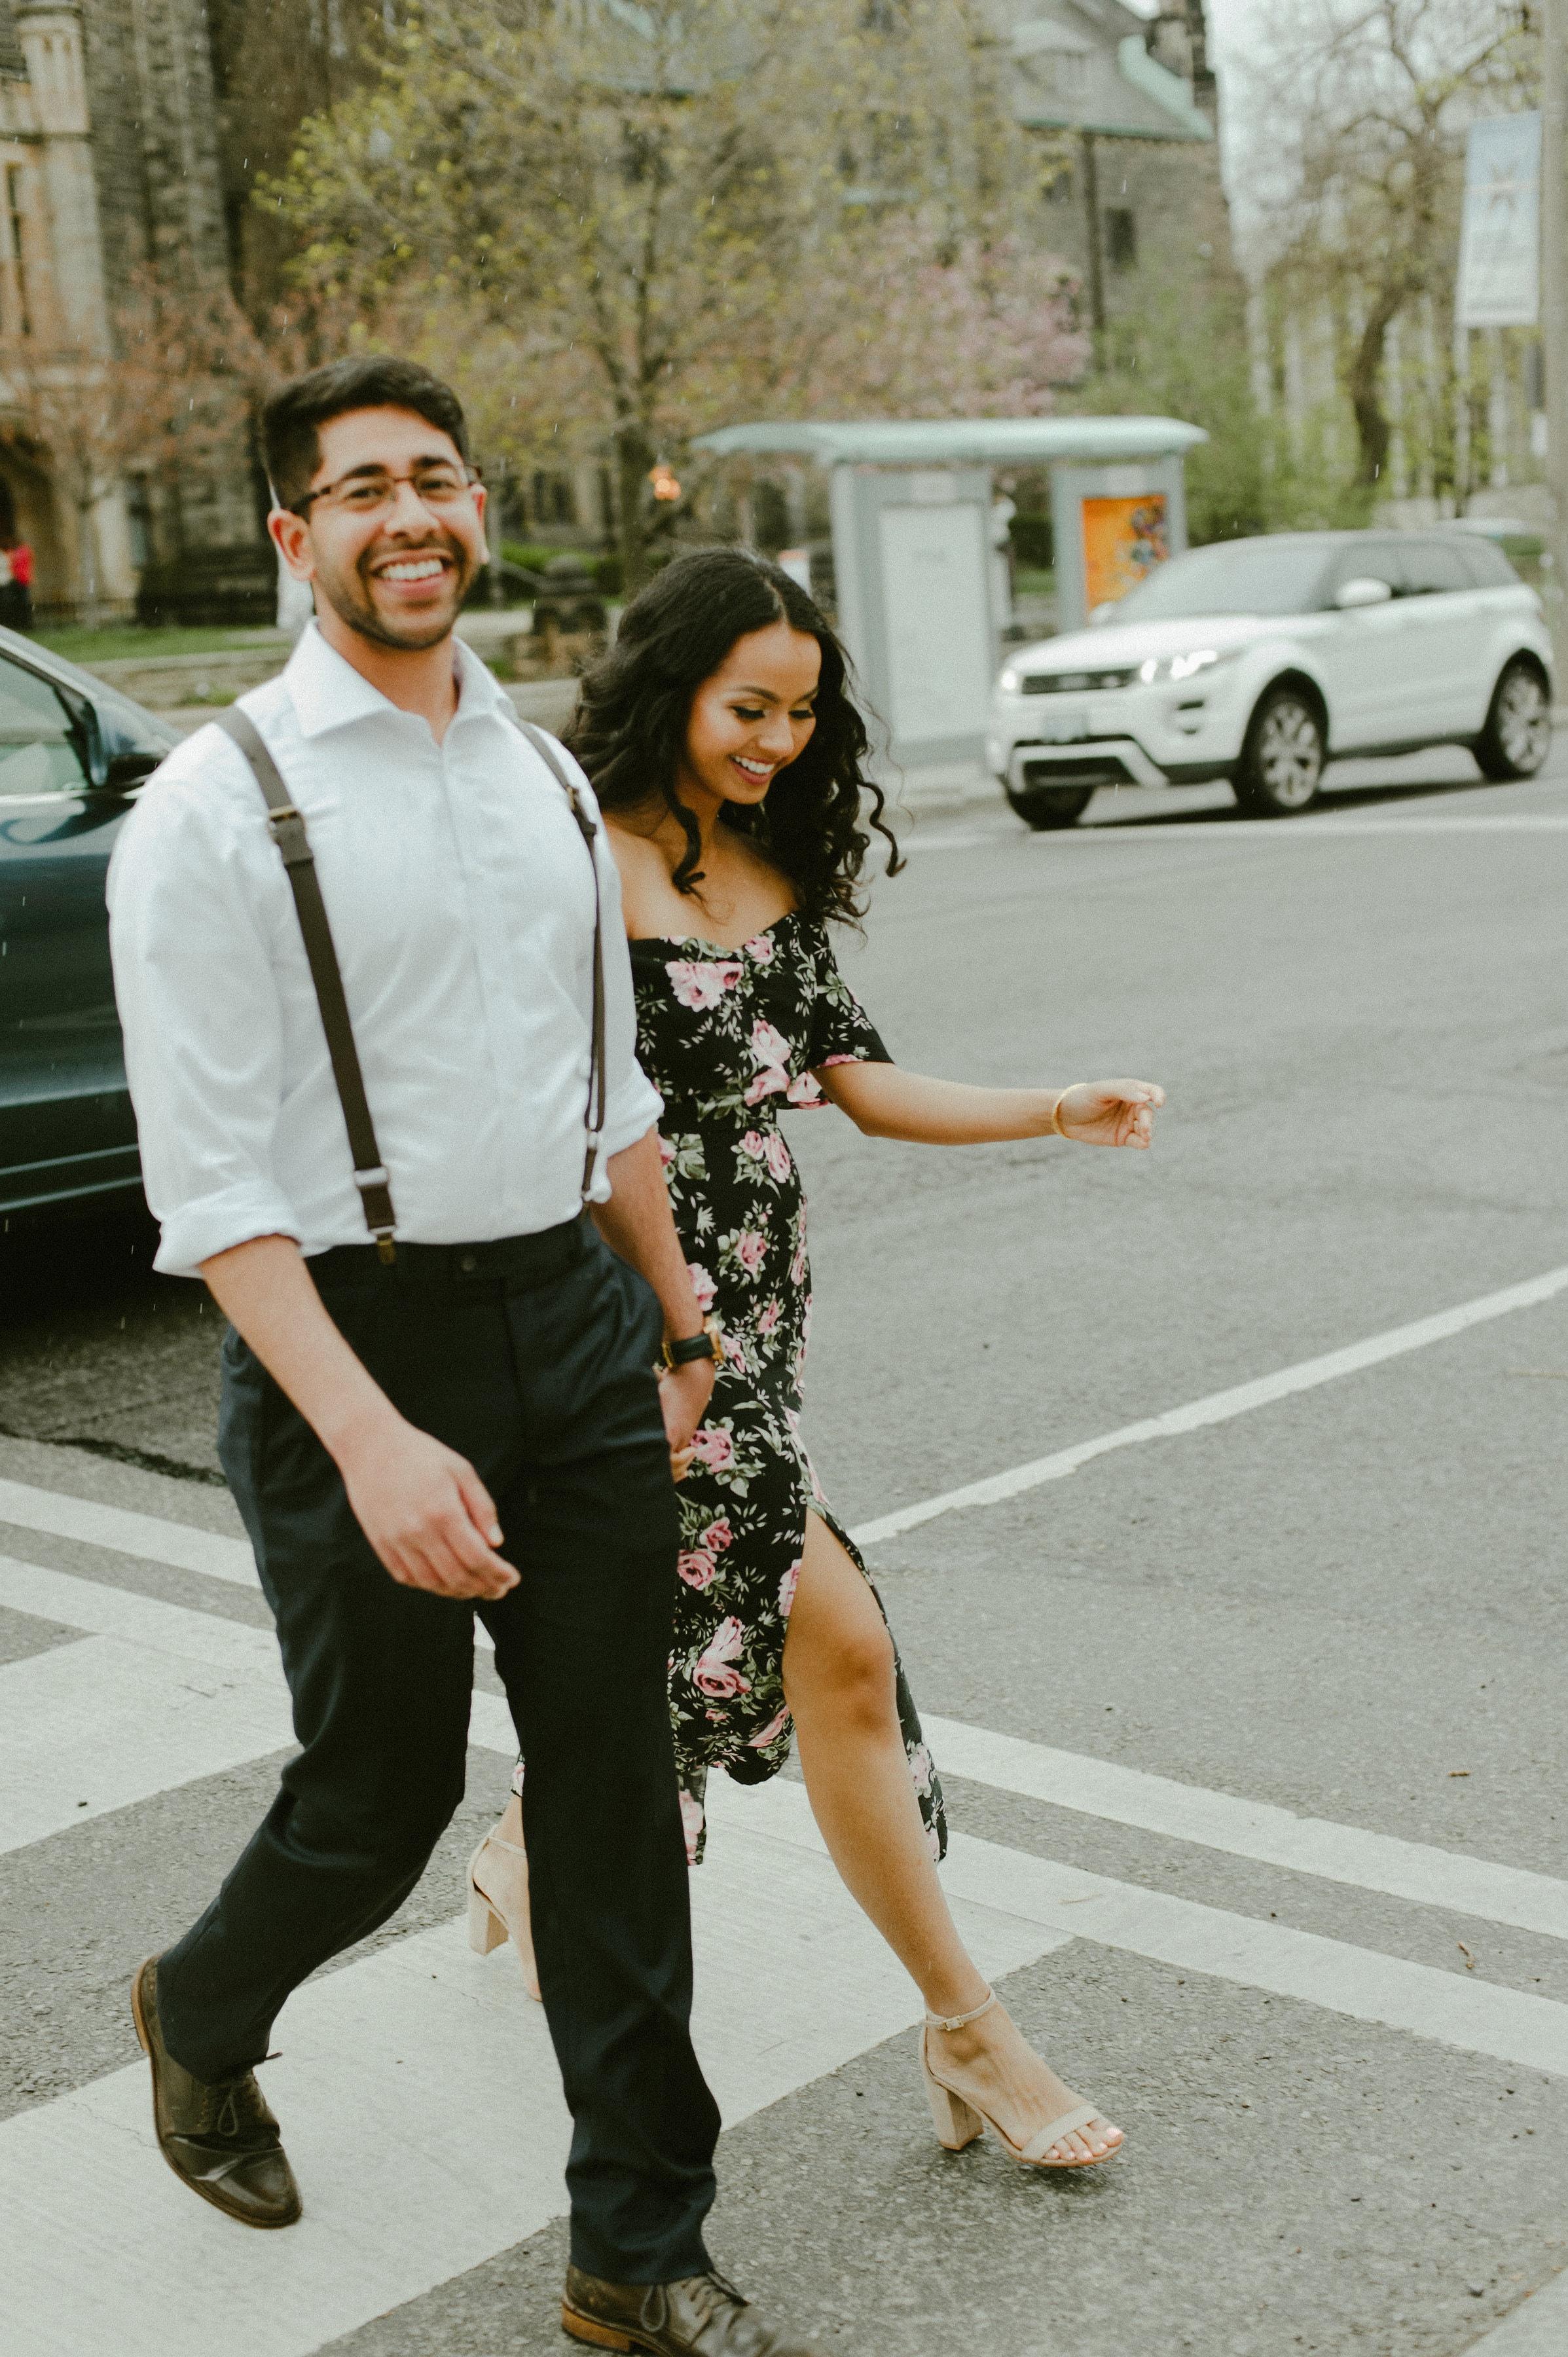 giuliana dating